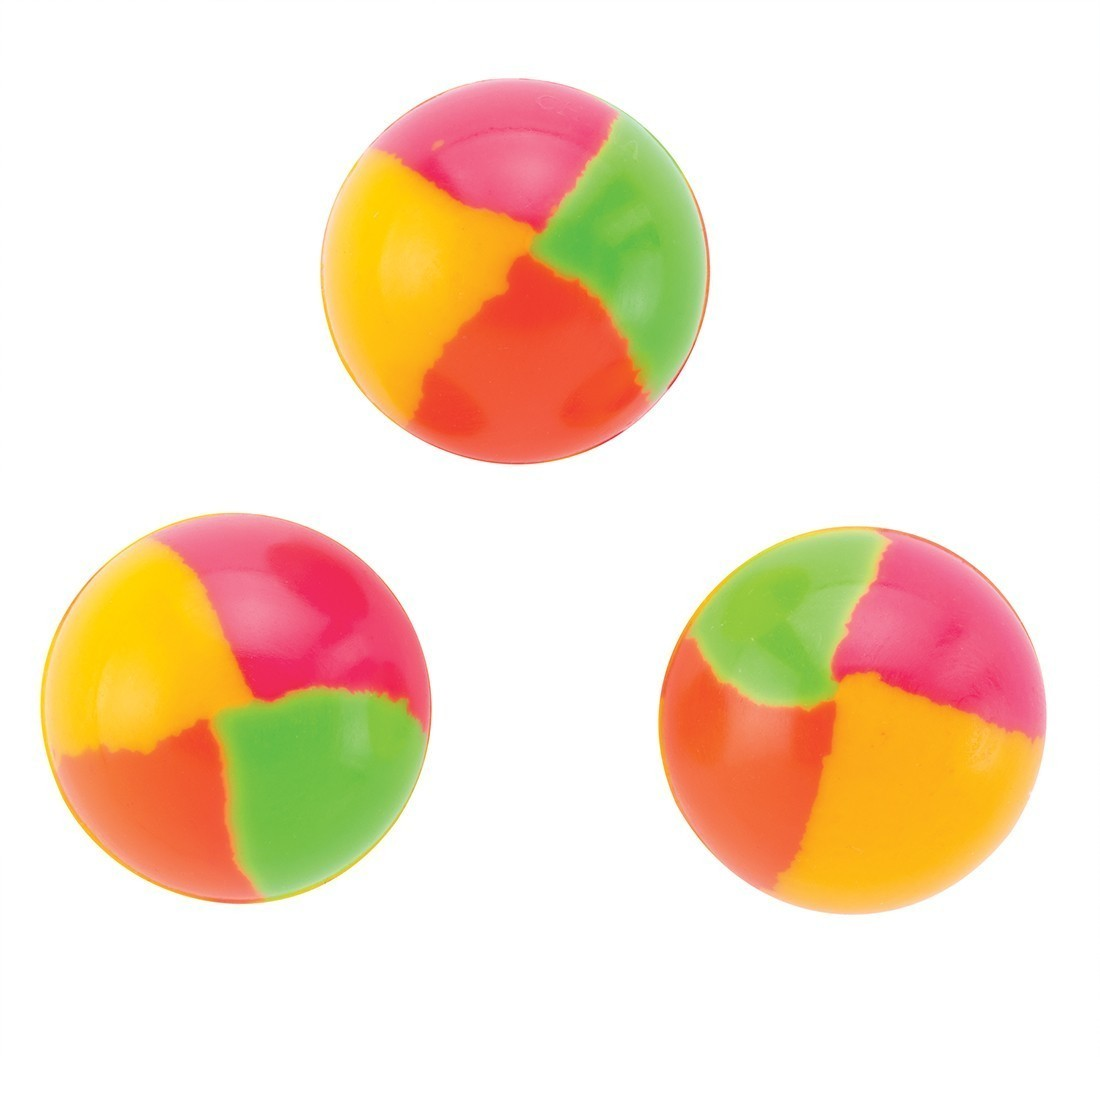 29mm Neon Circus Bouncing Balls [image]